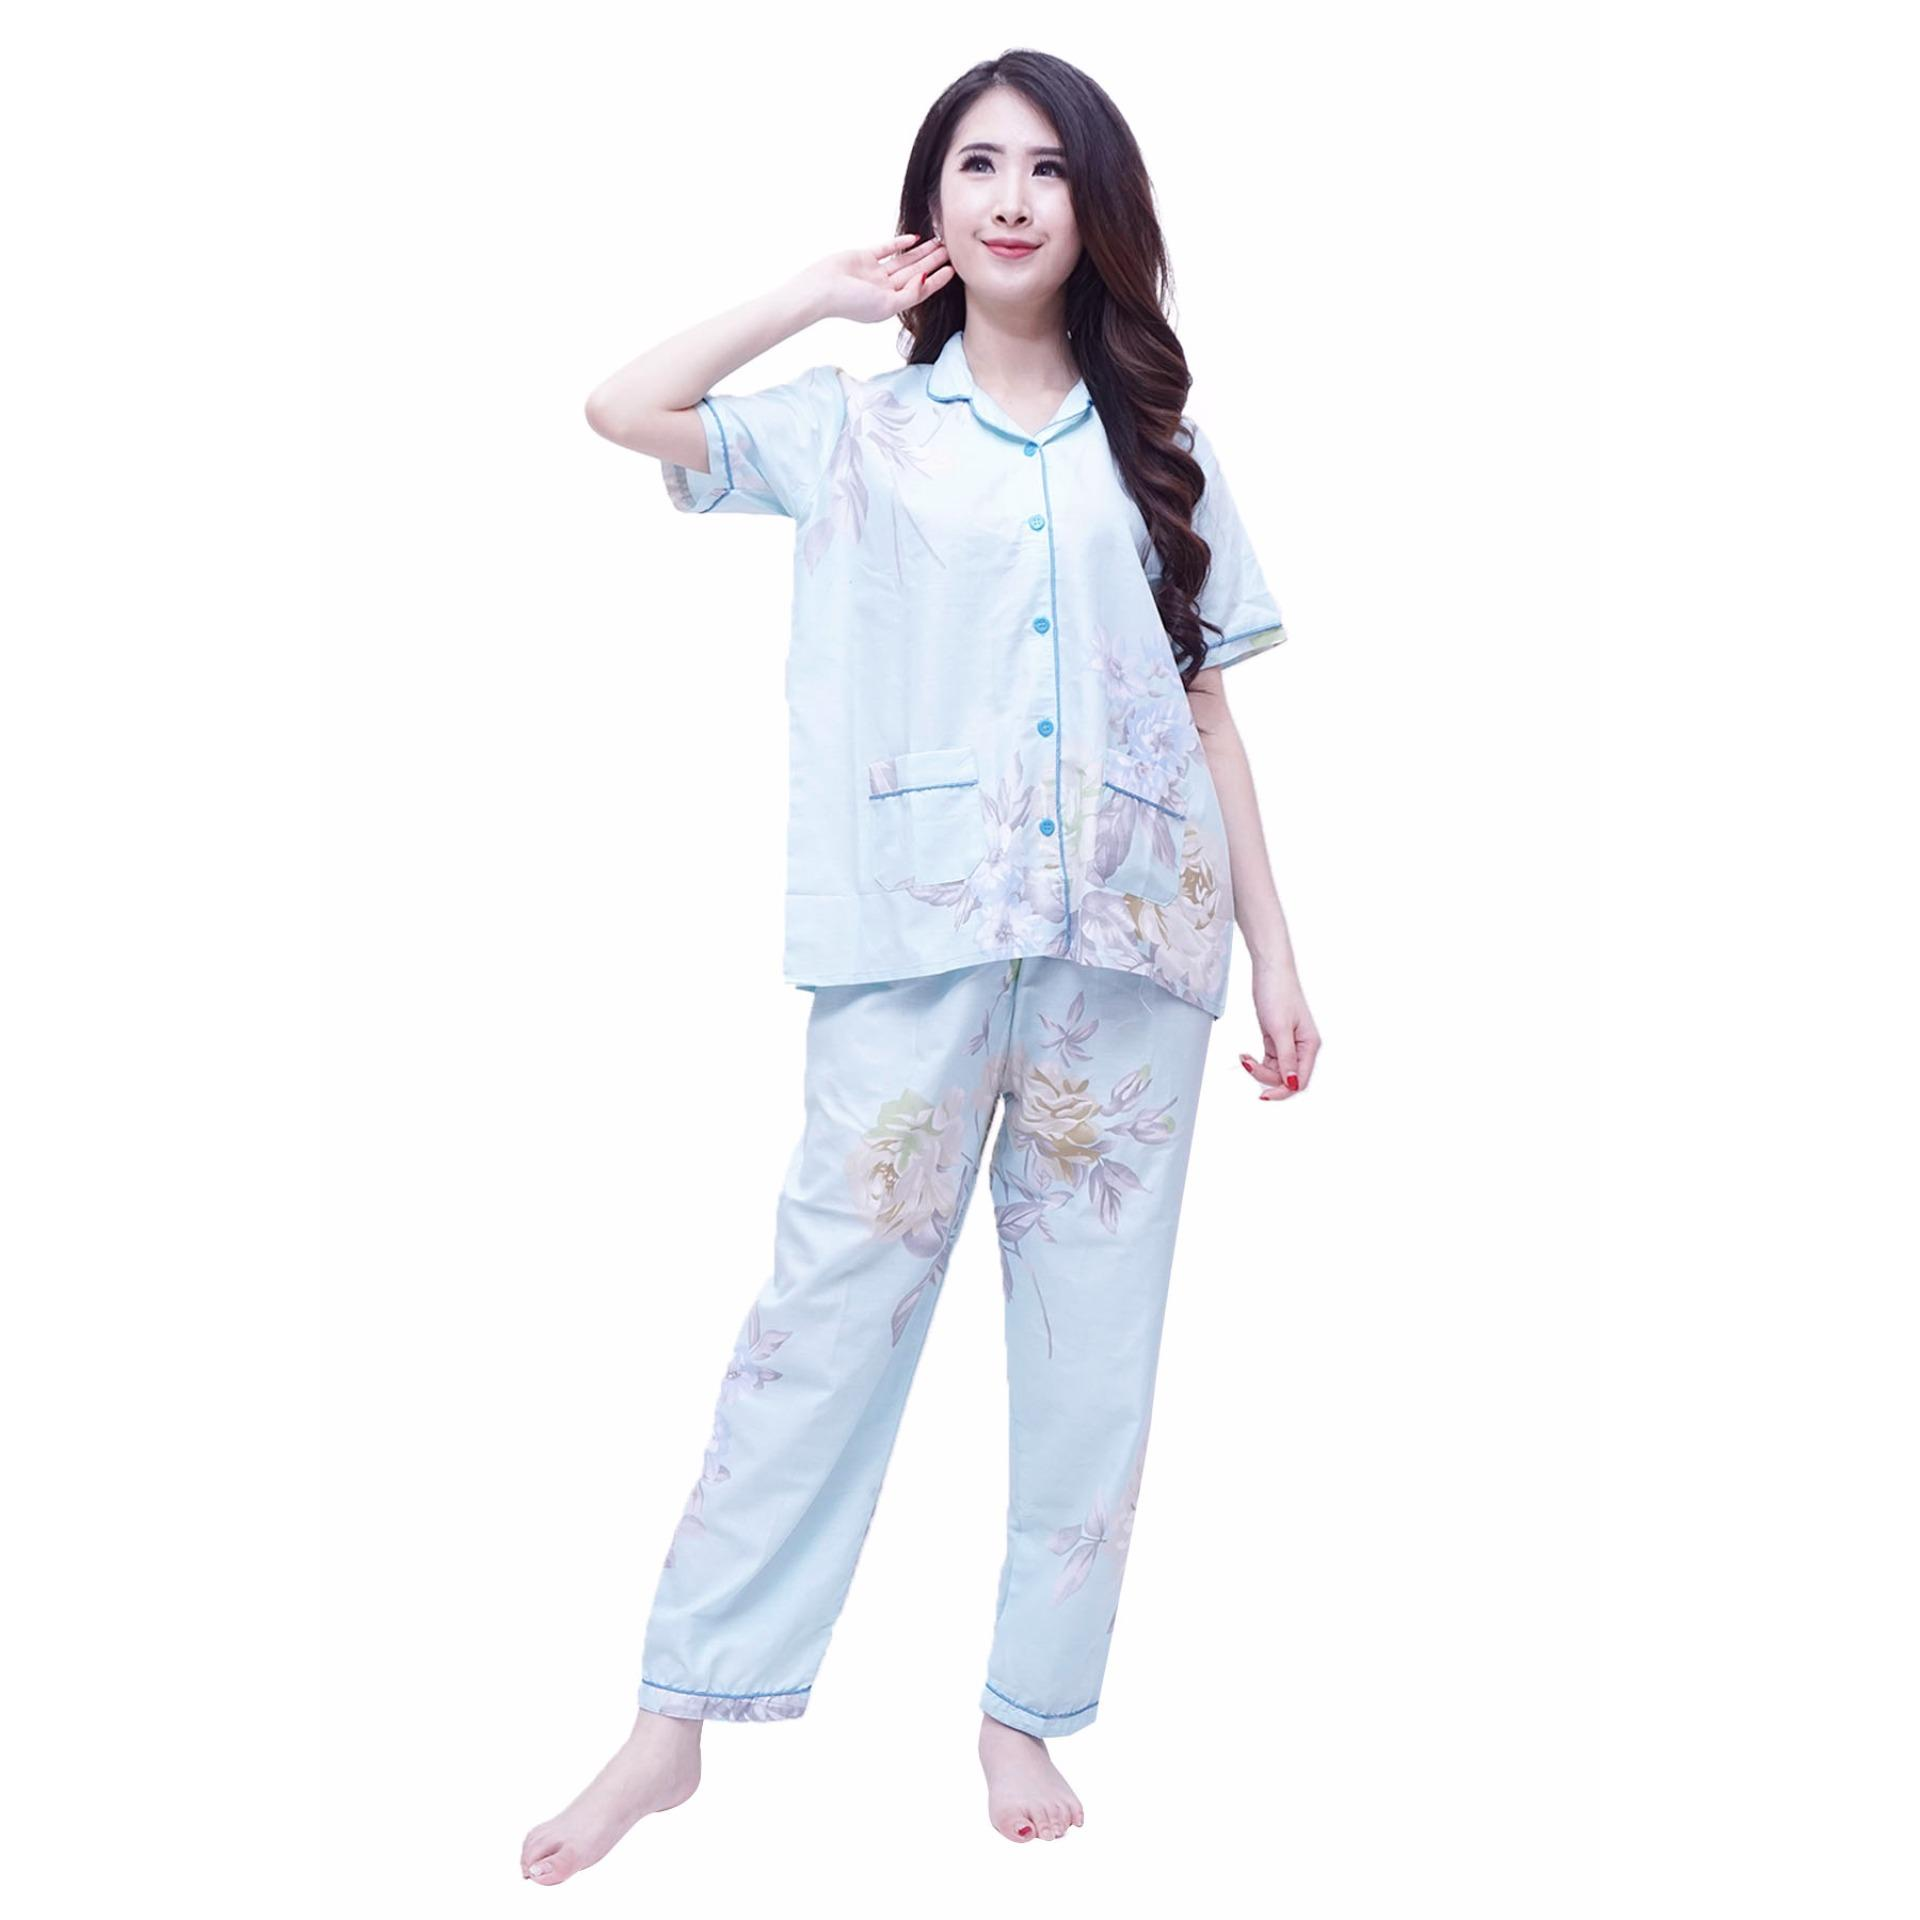 Beli Quincy Baju Tidur Gretha Piyama Celana Panjang Tosca Quincylabel Online